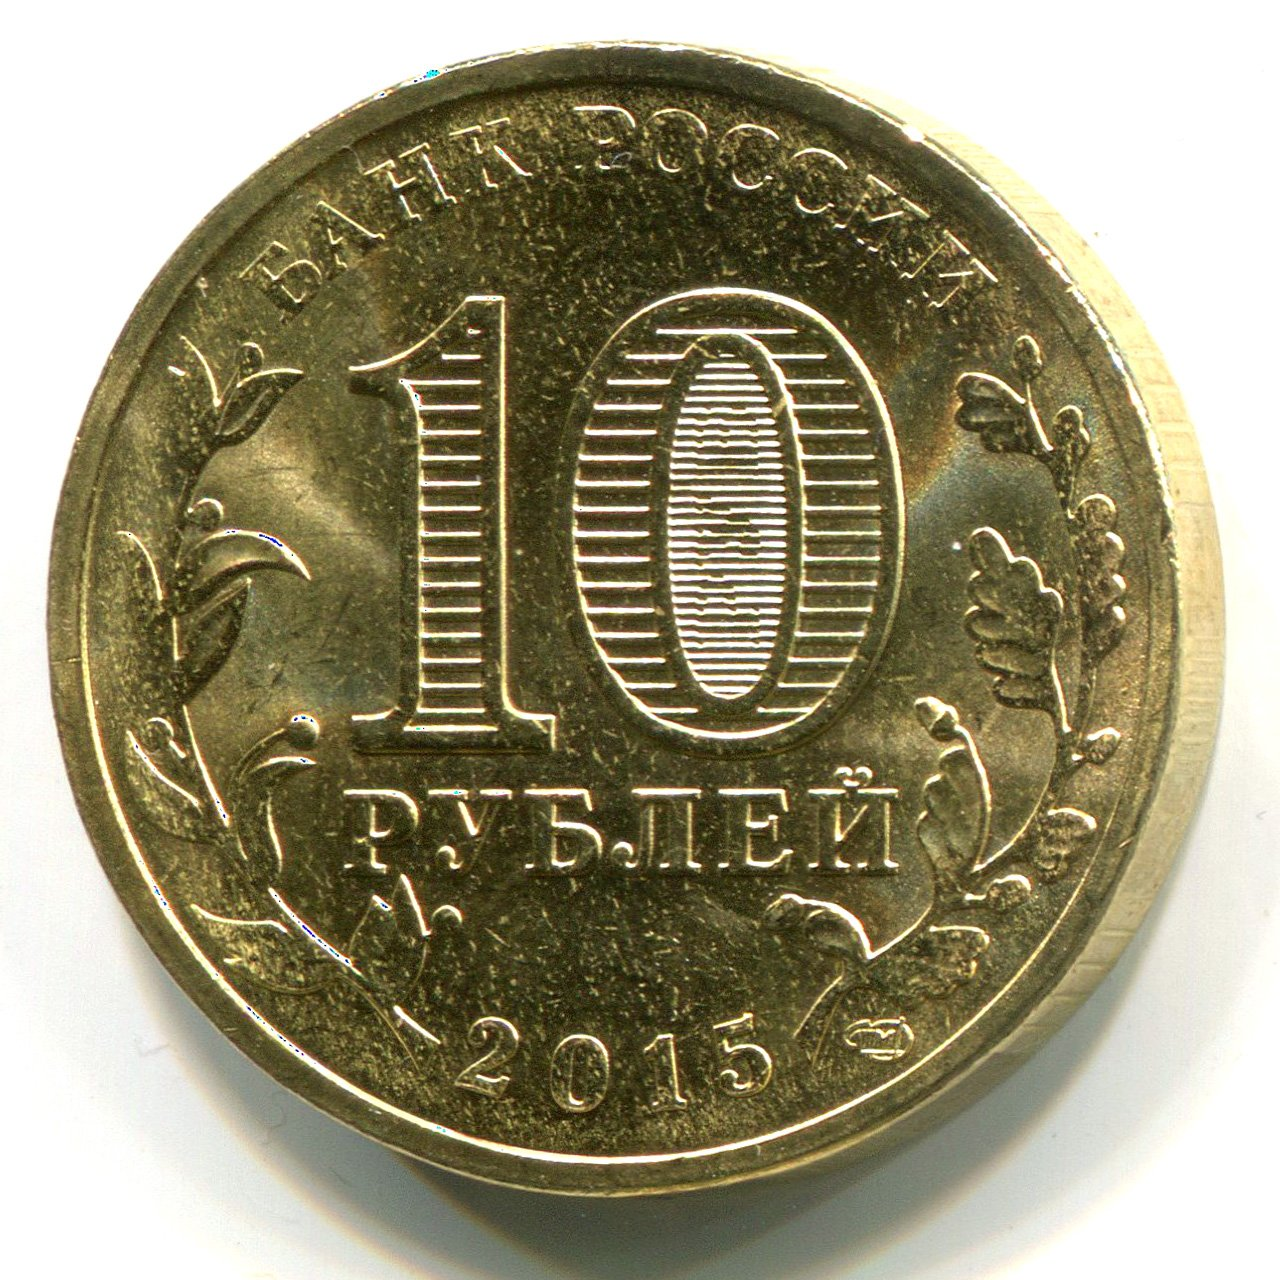 Монета гвс ломоносов интернет магазин 7 копеек